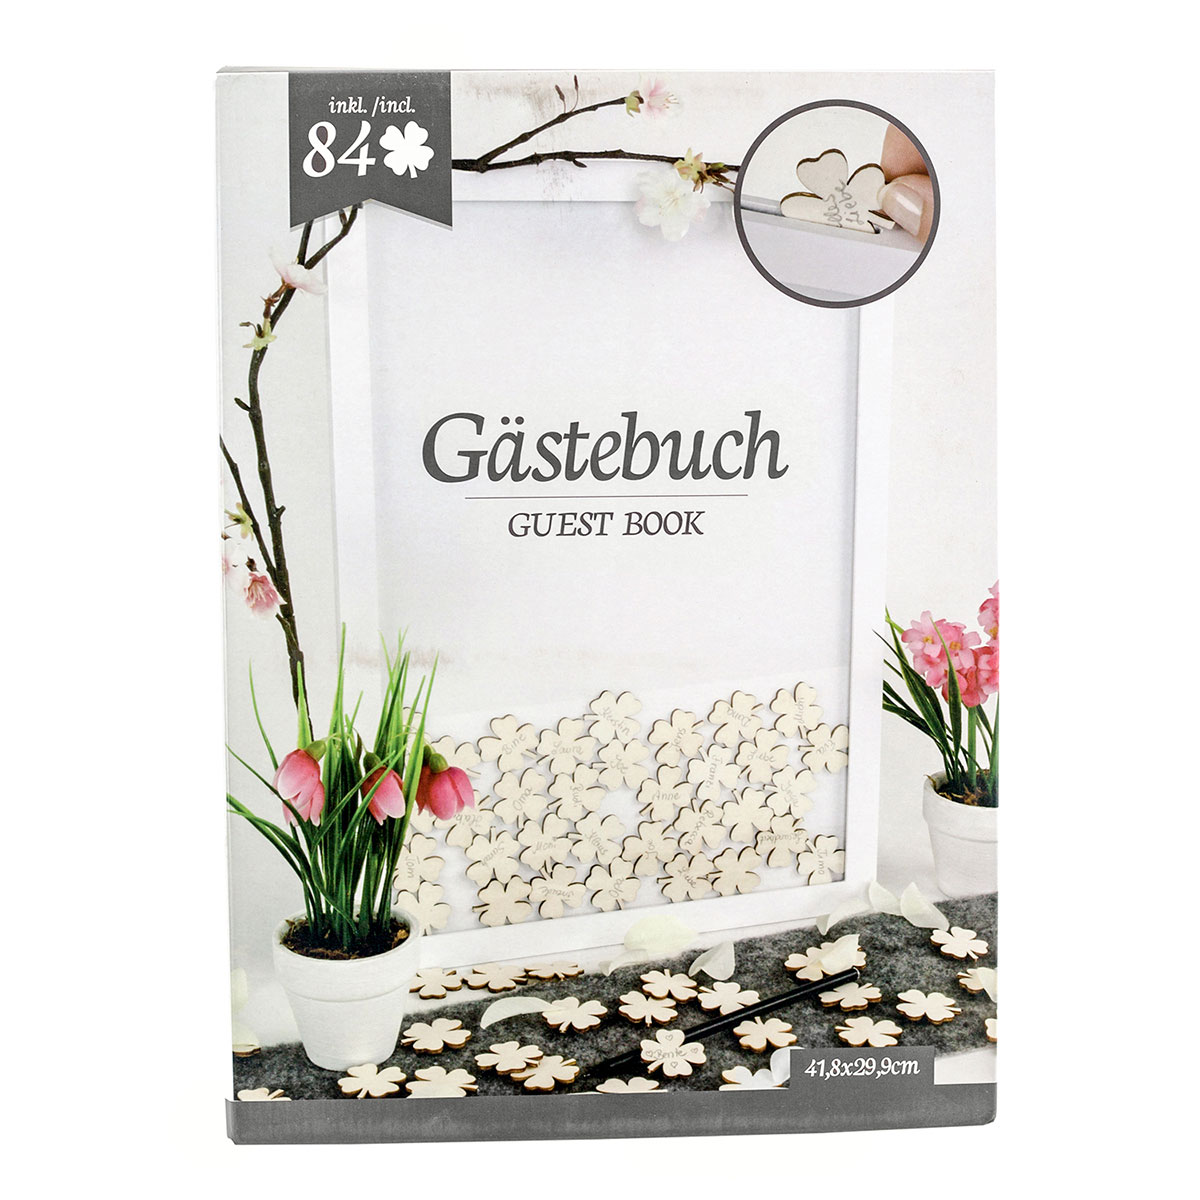 Gästebuch mit Kleeblatt, Bilderrahmen inklusive 84 Holzkleeblättern ...